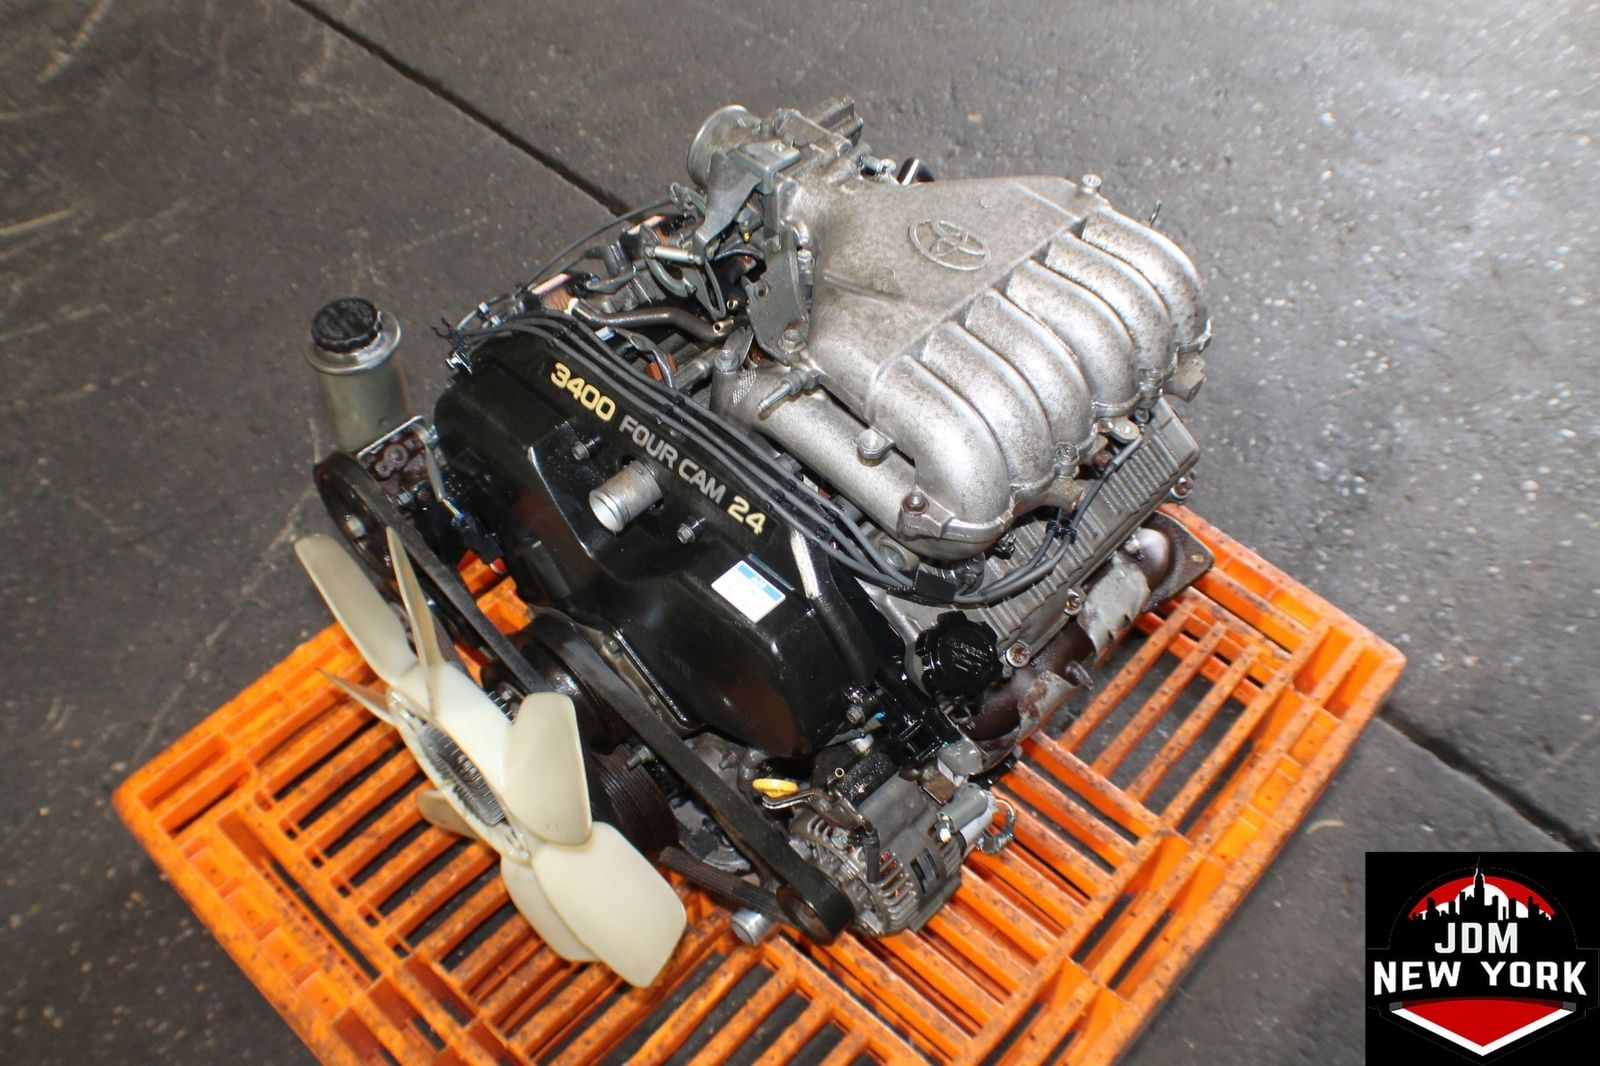 1998 toyota t100 engine diagram toyota tacoma 4runner t100 tundra 3 4l v6 engine jdm 5vz fe jdm  toyota tacoma 4runner t100 tundra 3 4l